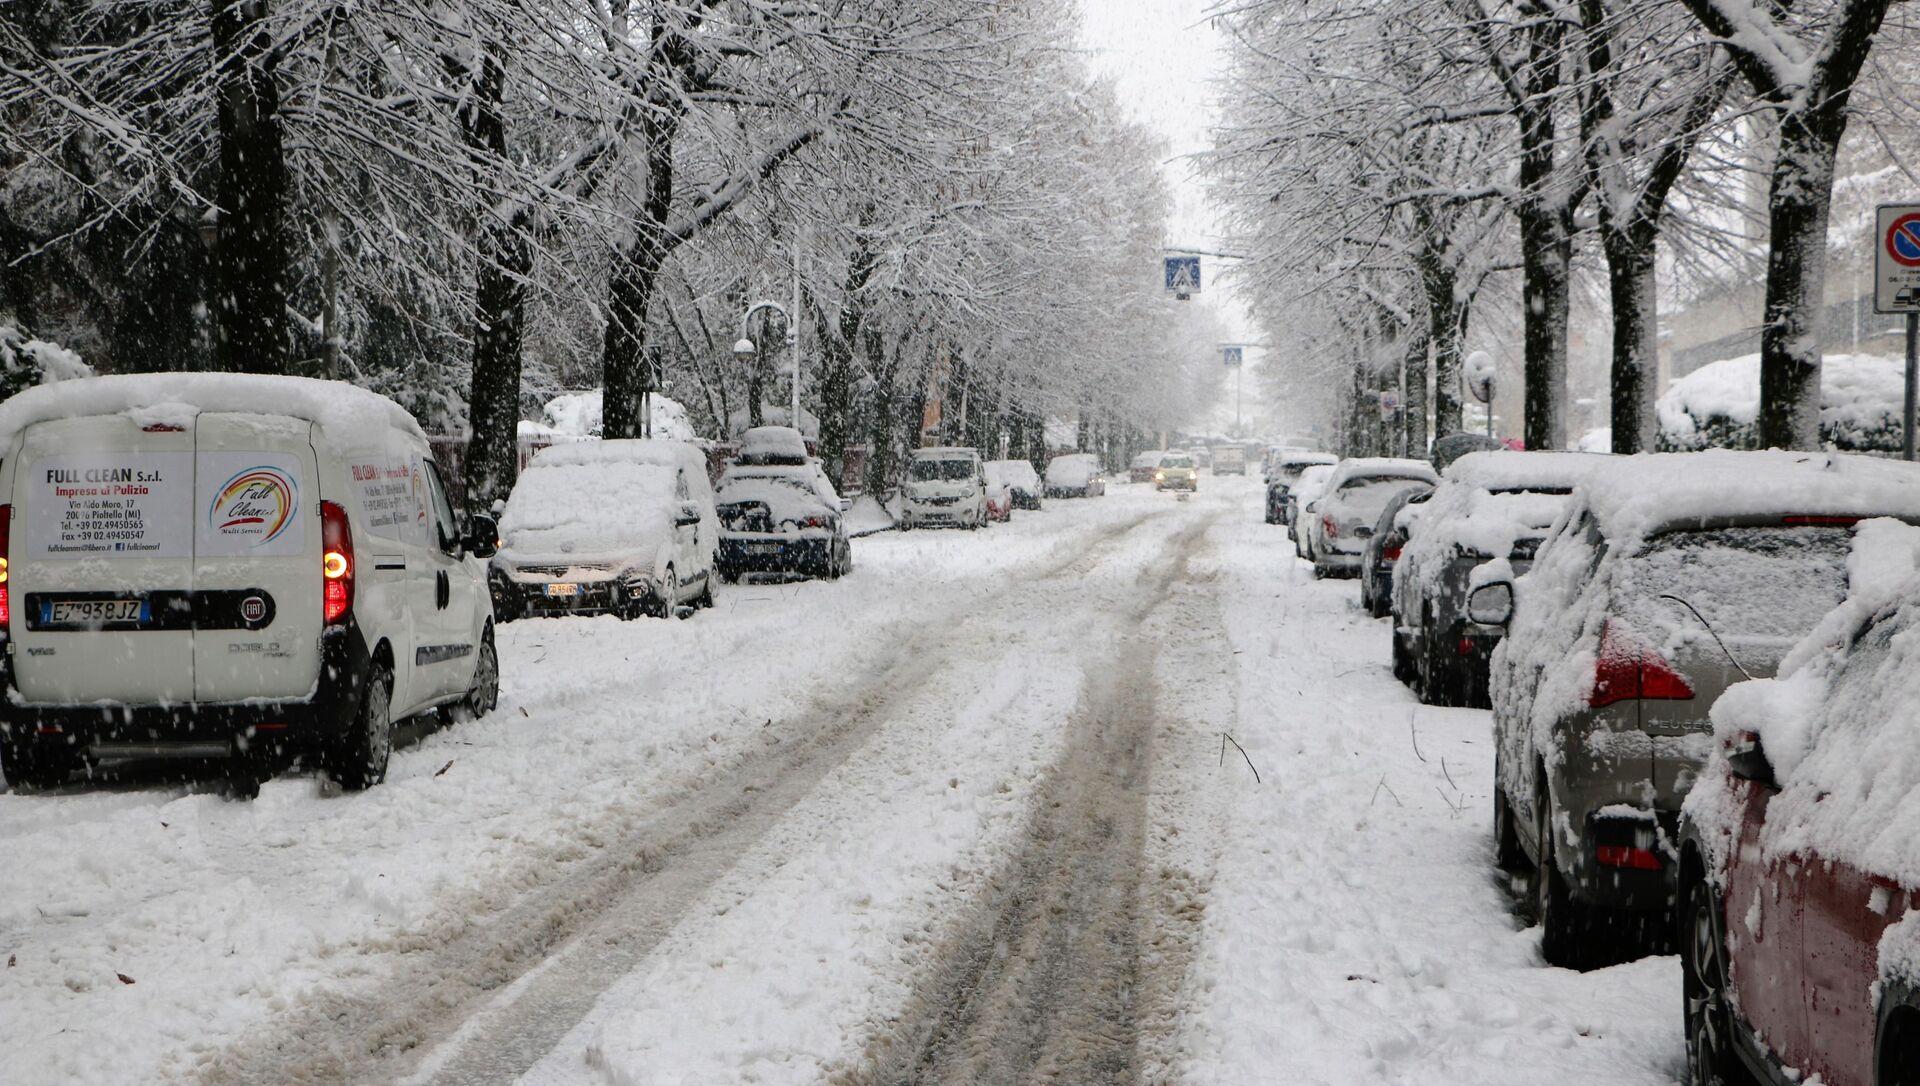 Inverno a Milano - Sputnik Italia, 1920, 15.02.2021